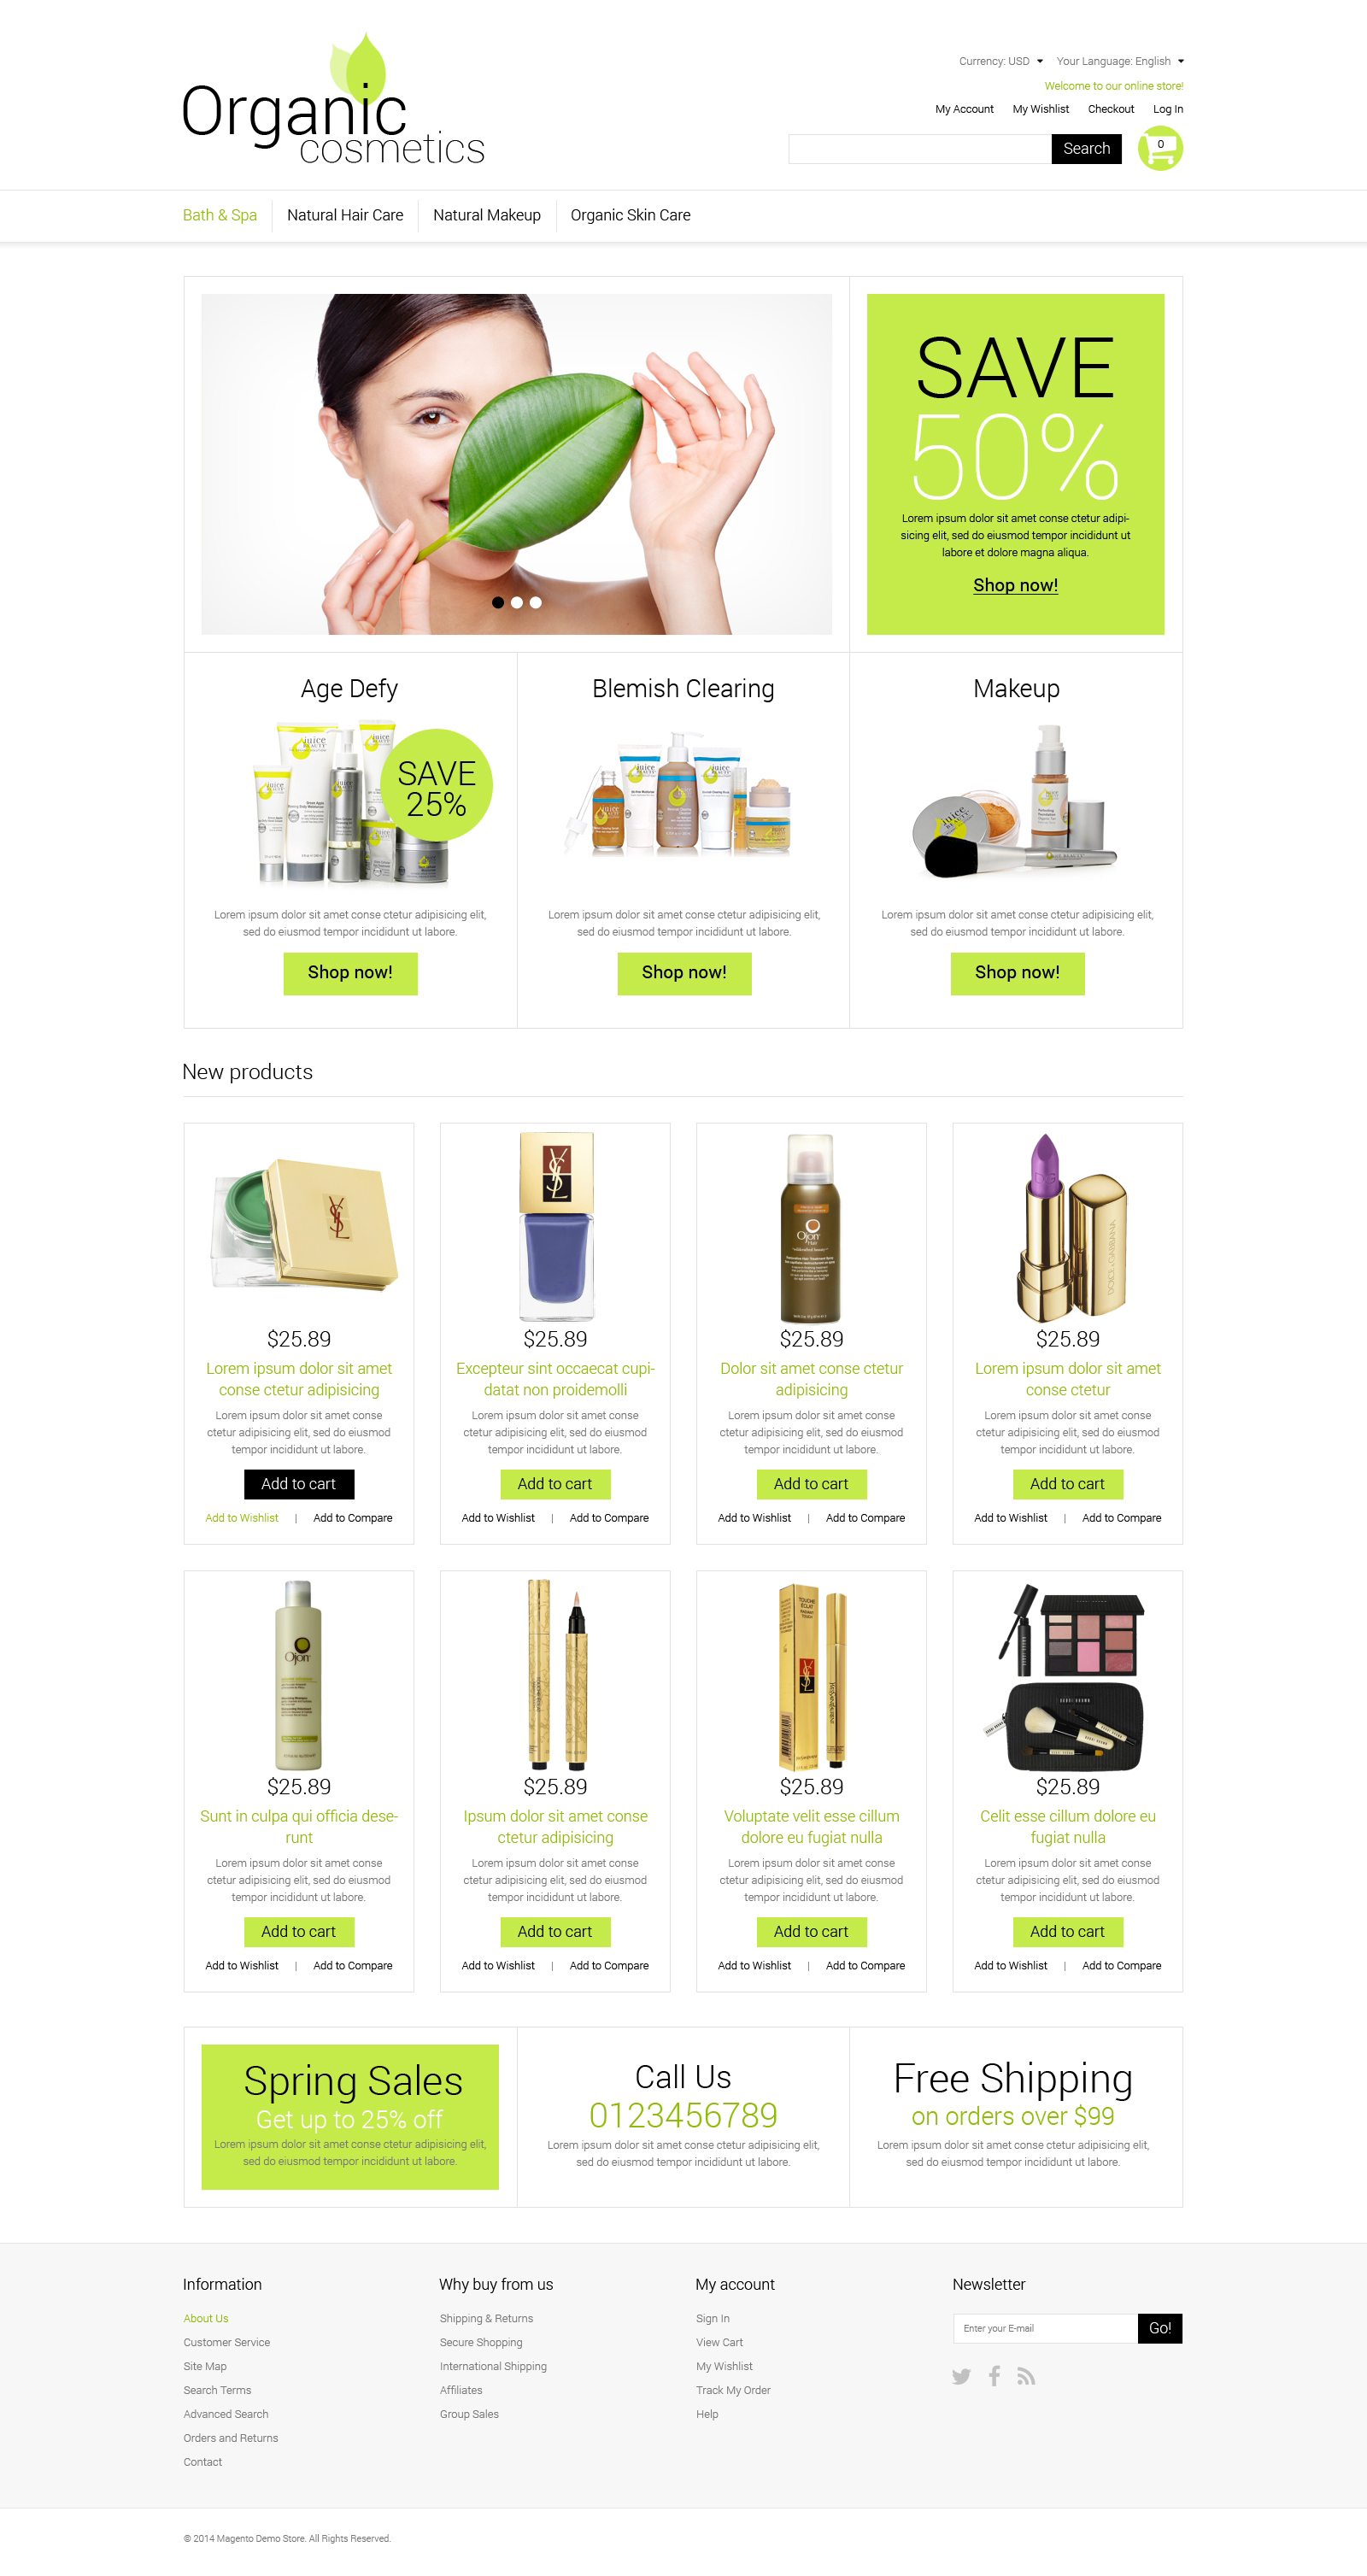 how to make organic cosmetics